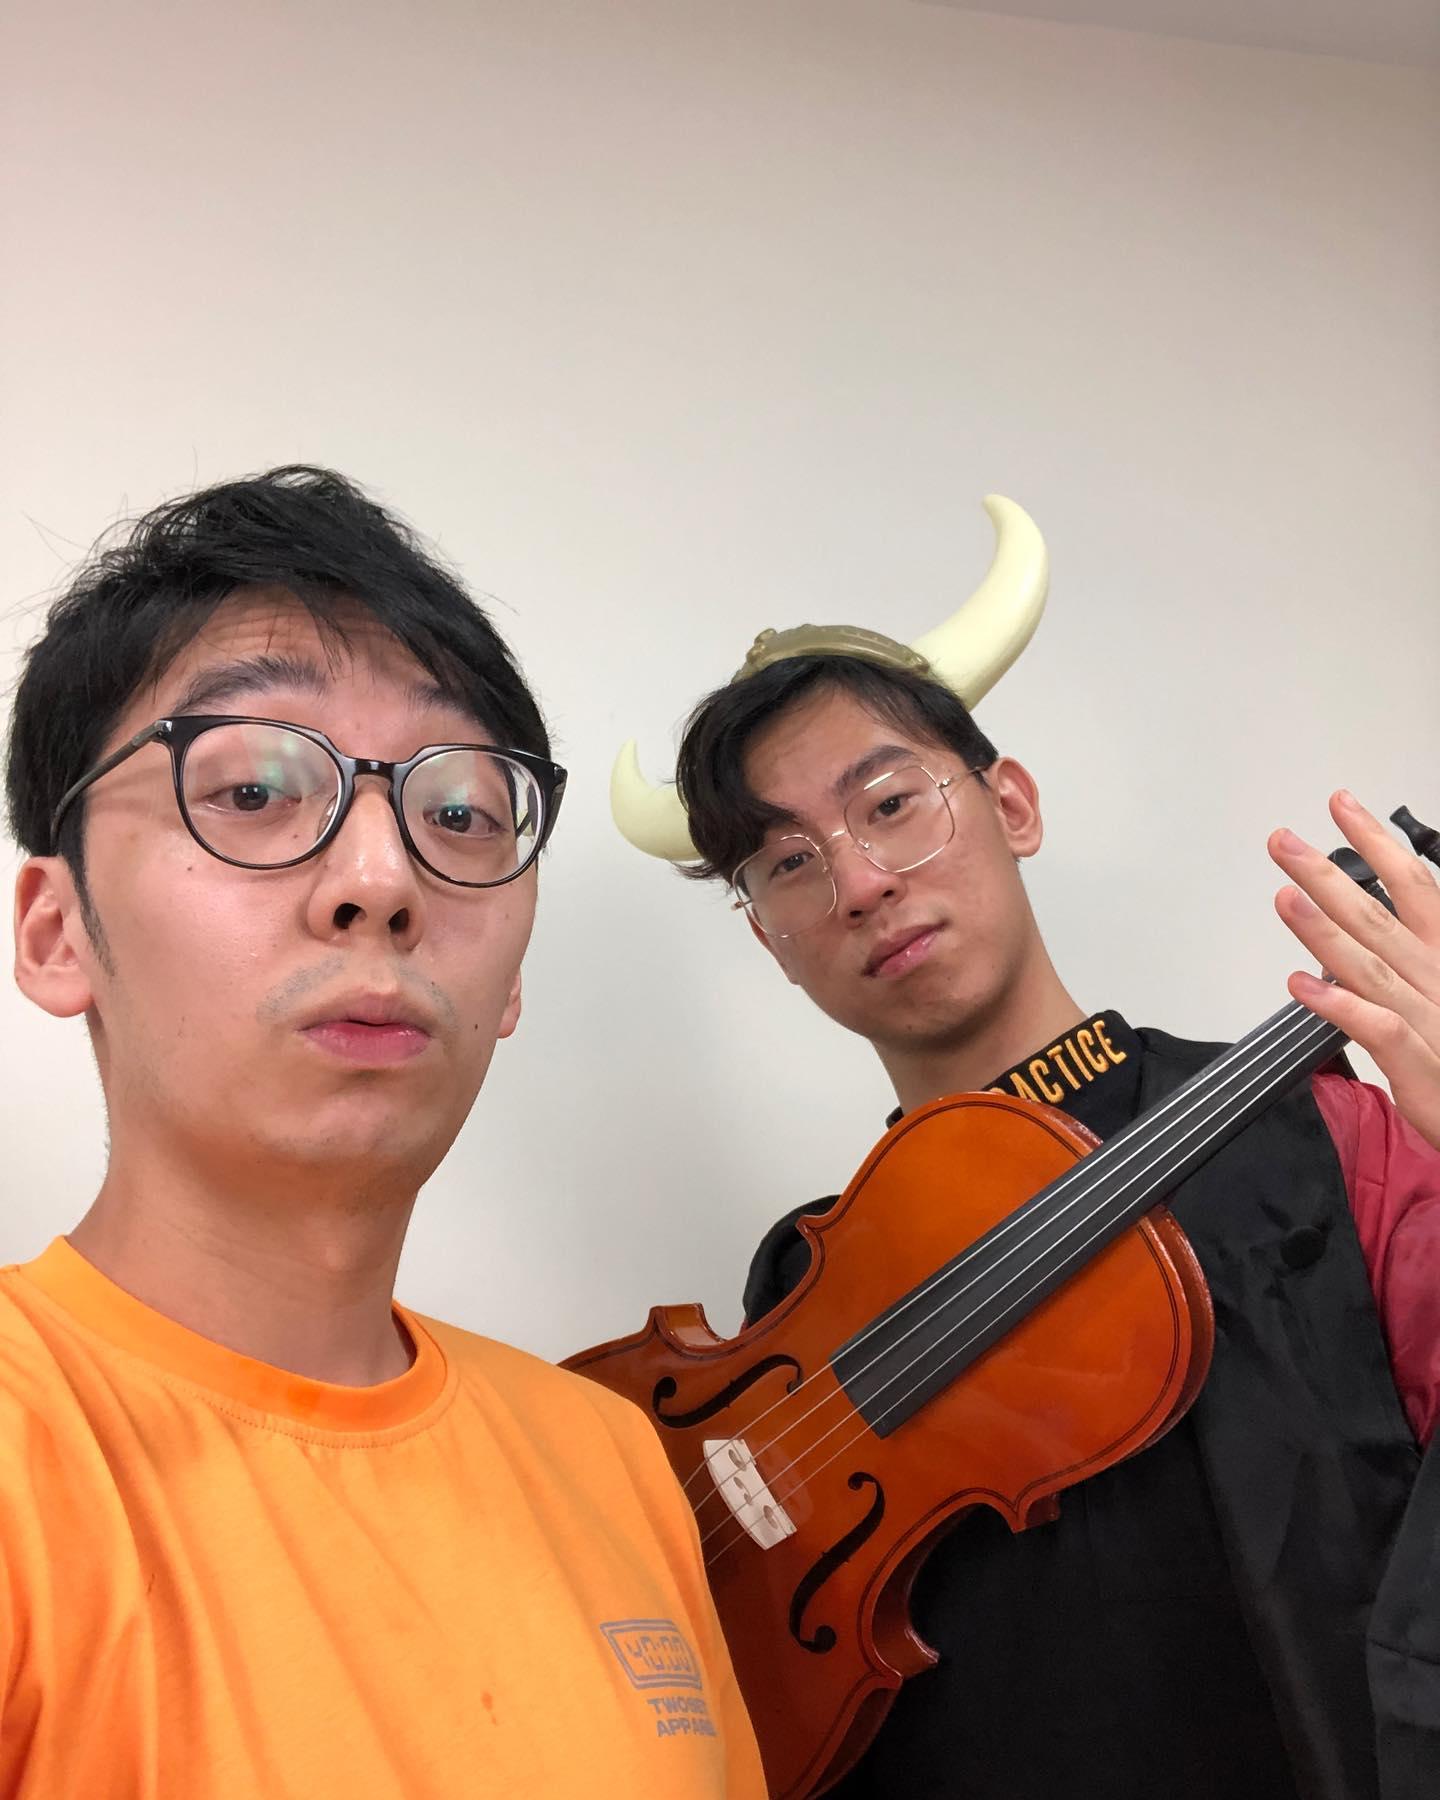 Did your teacher take a secret cut when you bought a violin?